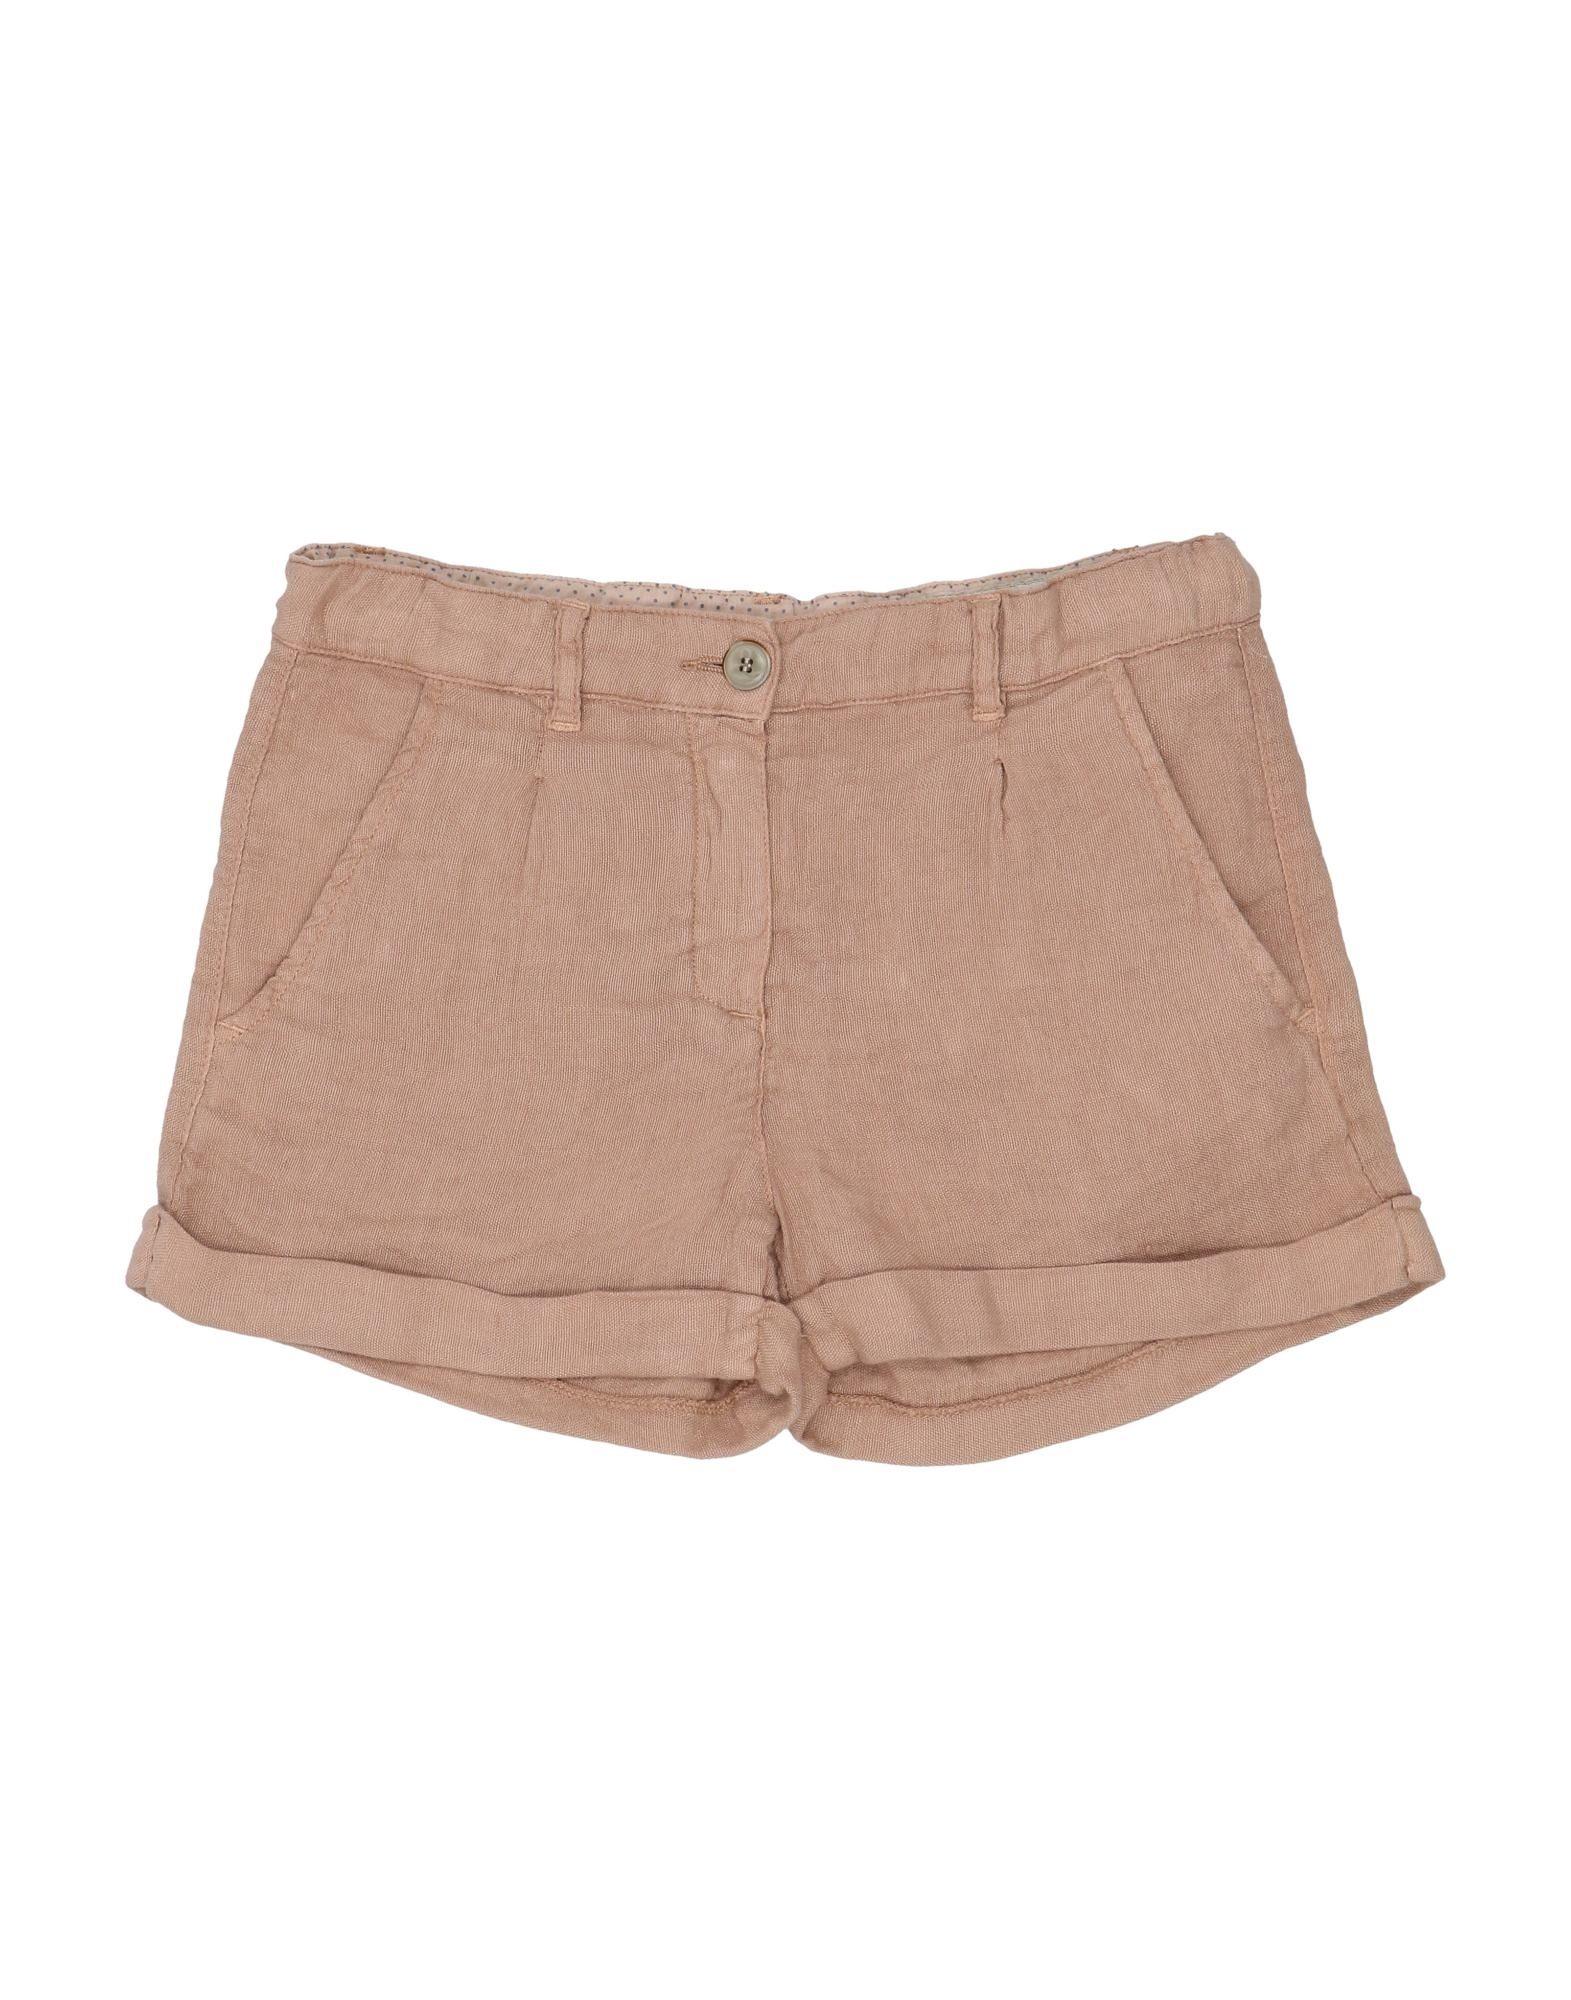 Novemb3r Kids' Shorts In Pink